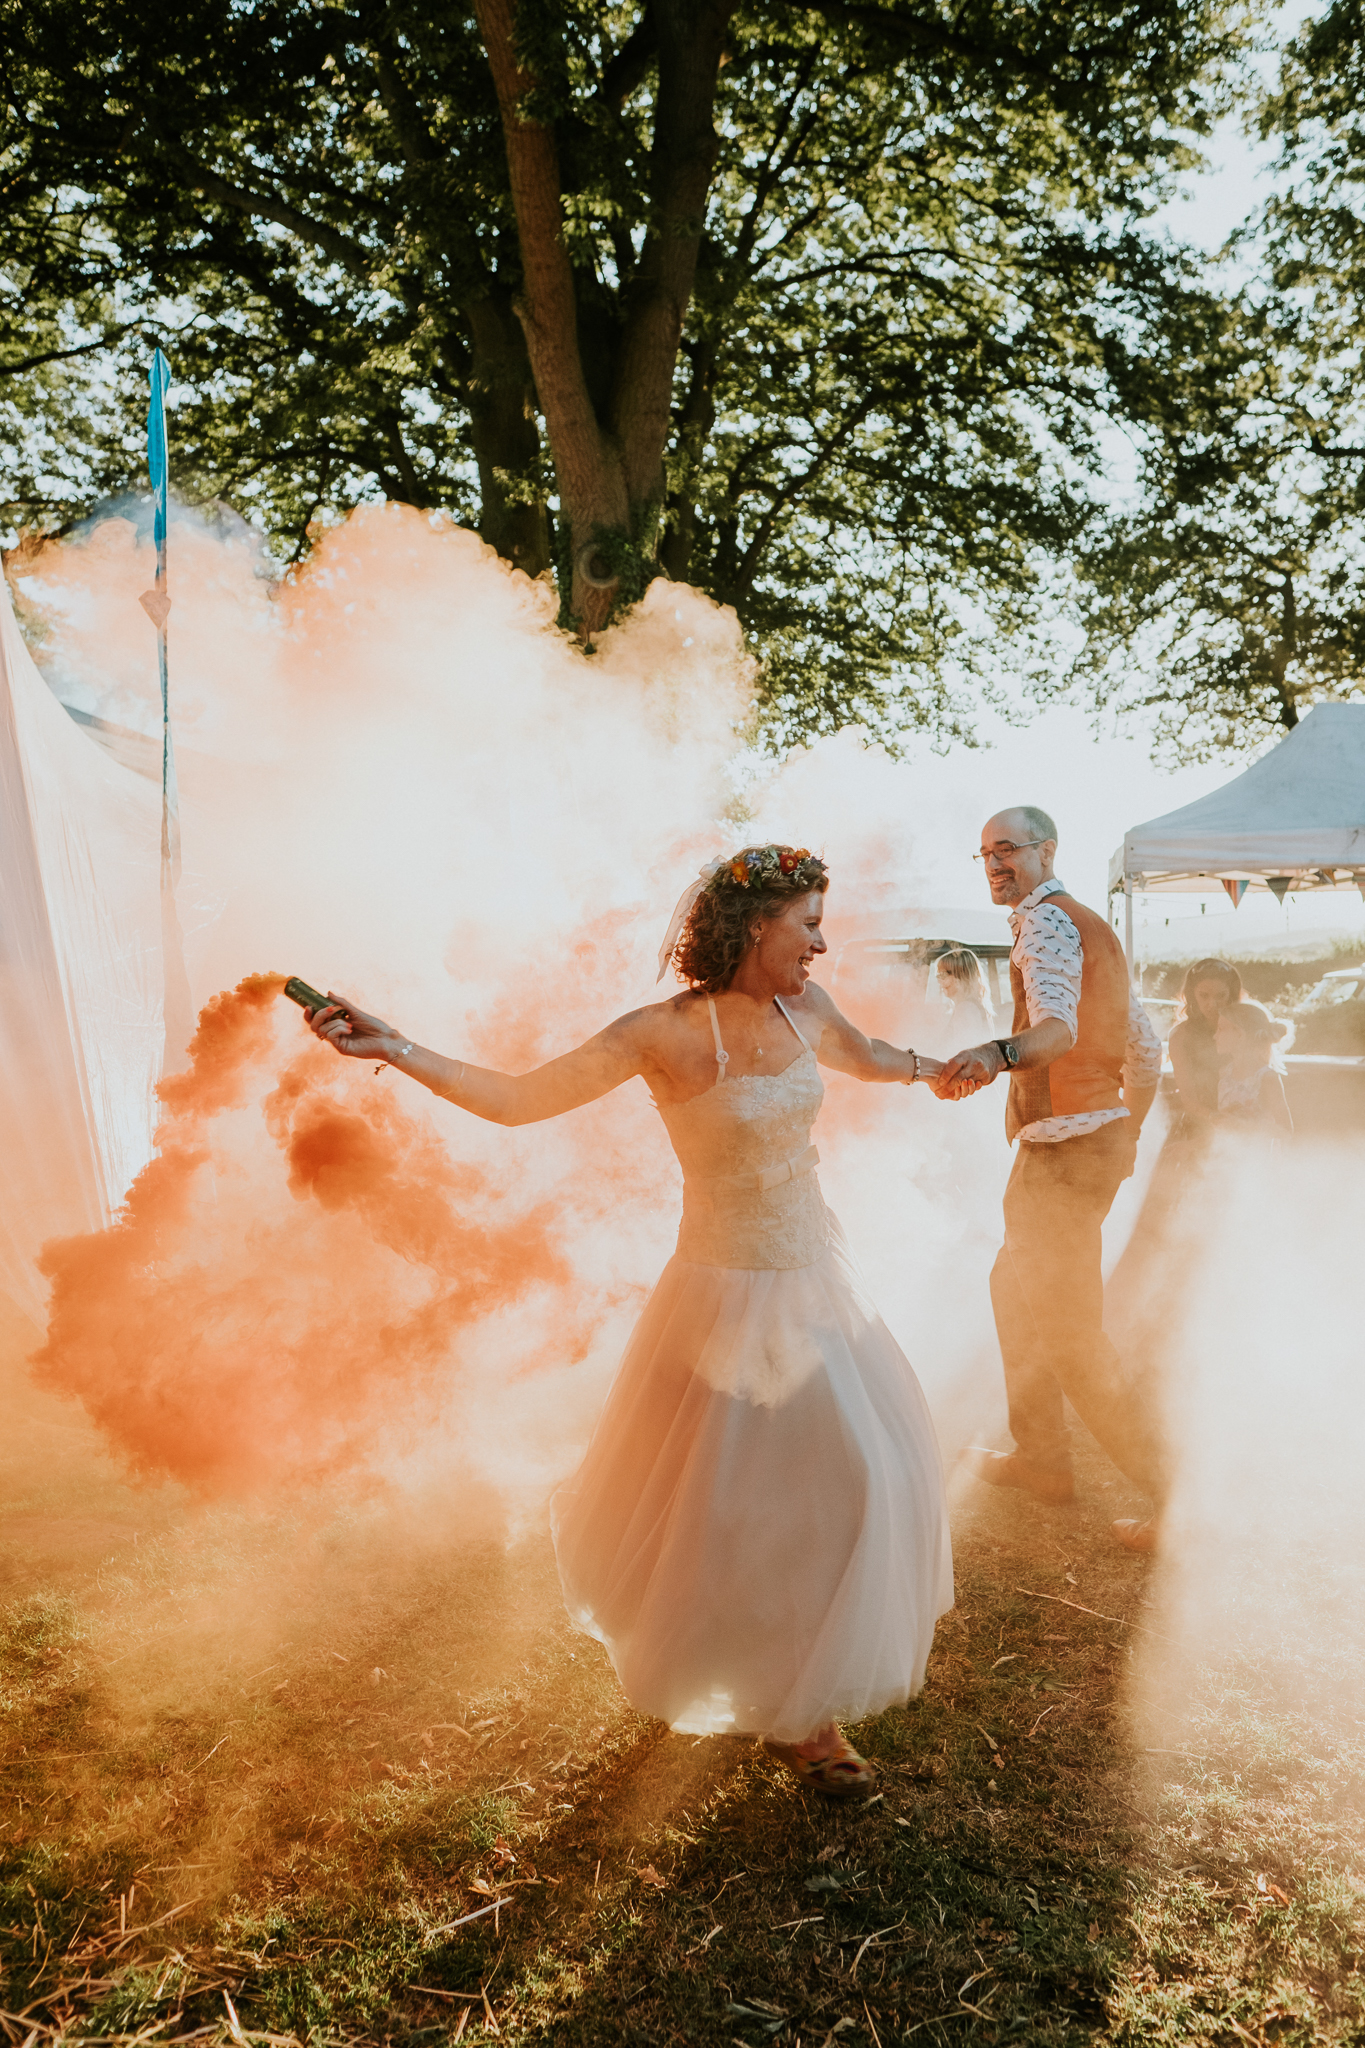 40 Festival wedding smoke bombs fun creative cool joanna nicole photography3.jpg